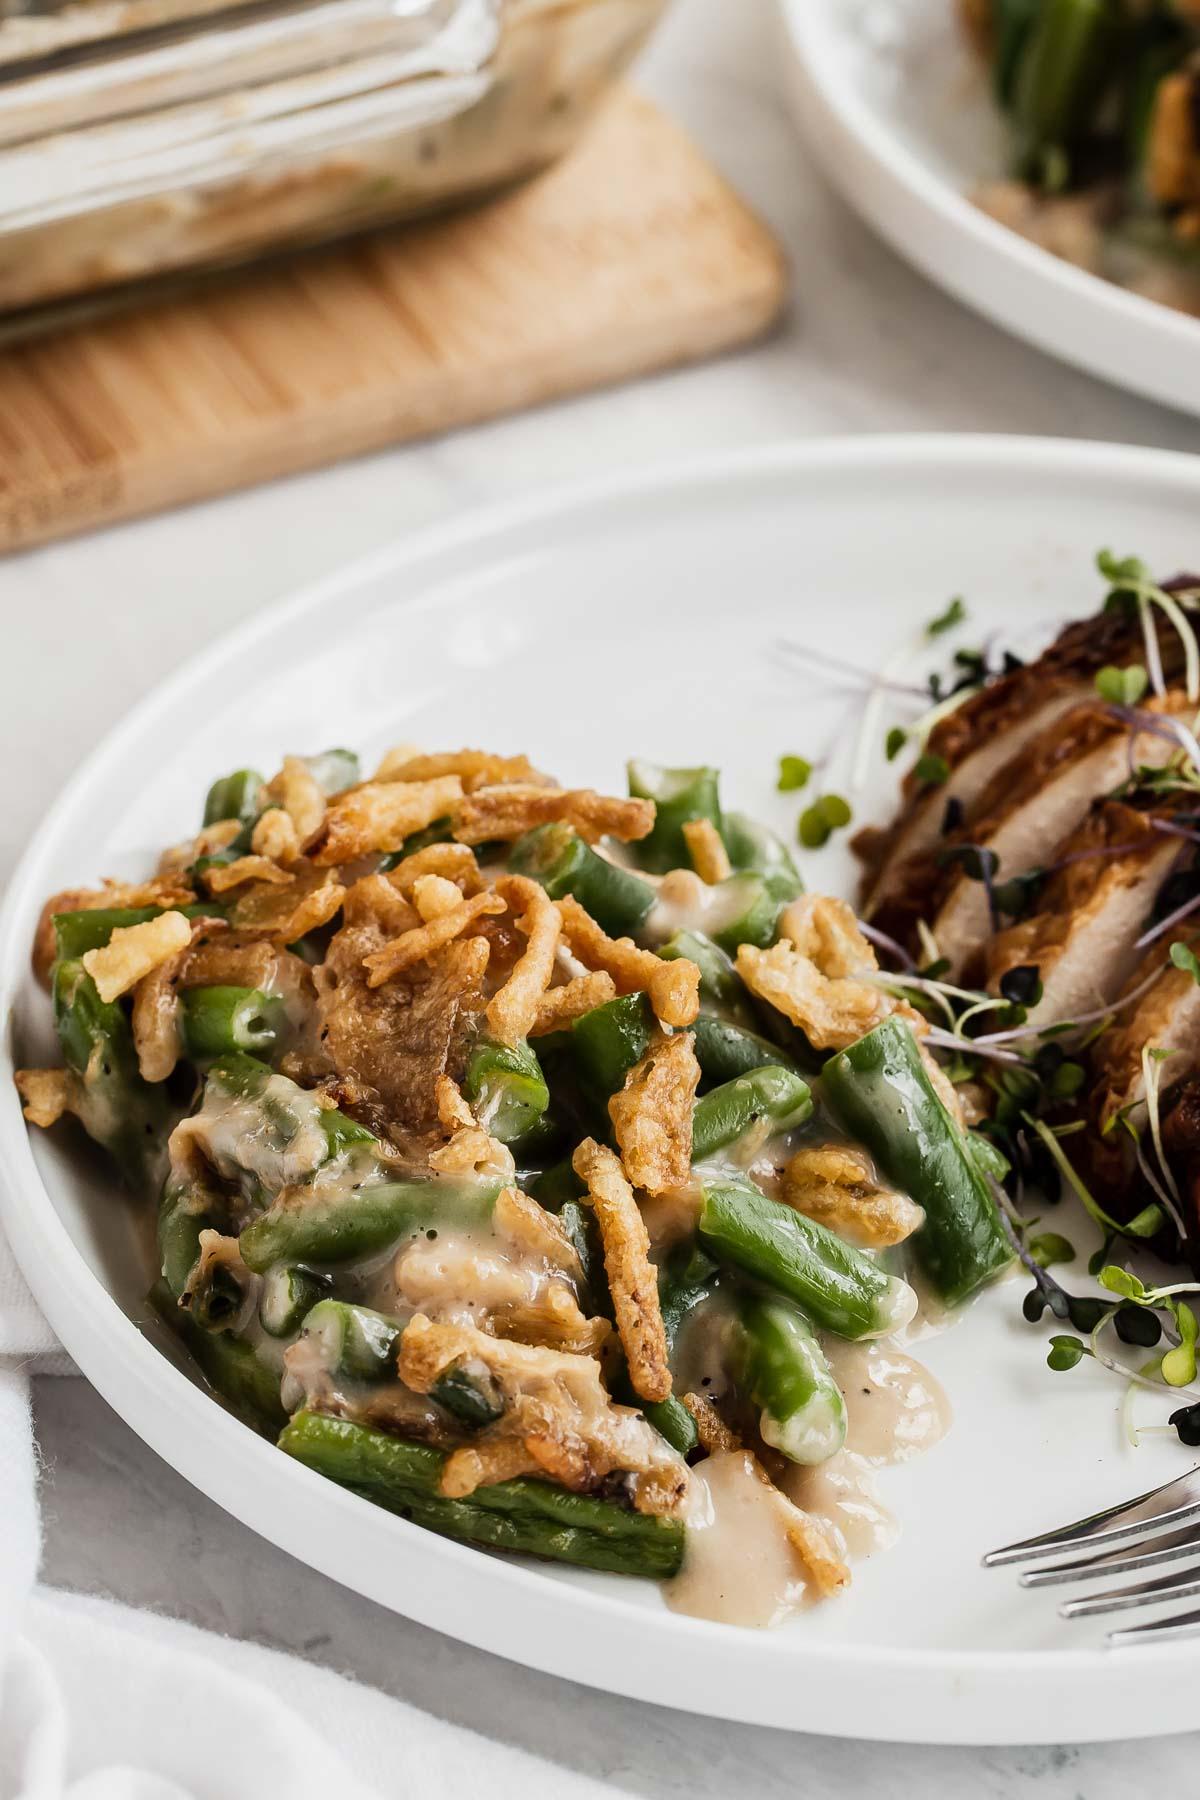 Green bean casserole next to sliced turkey on plate.